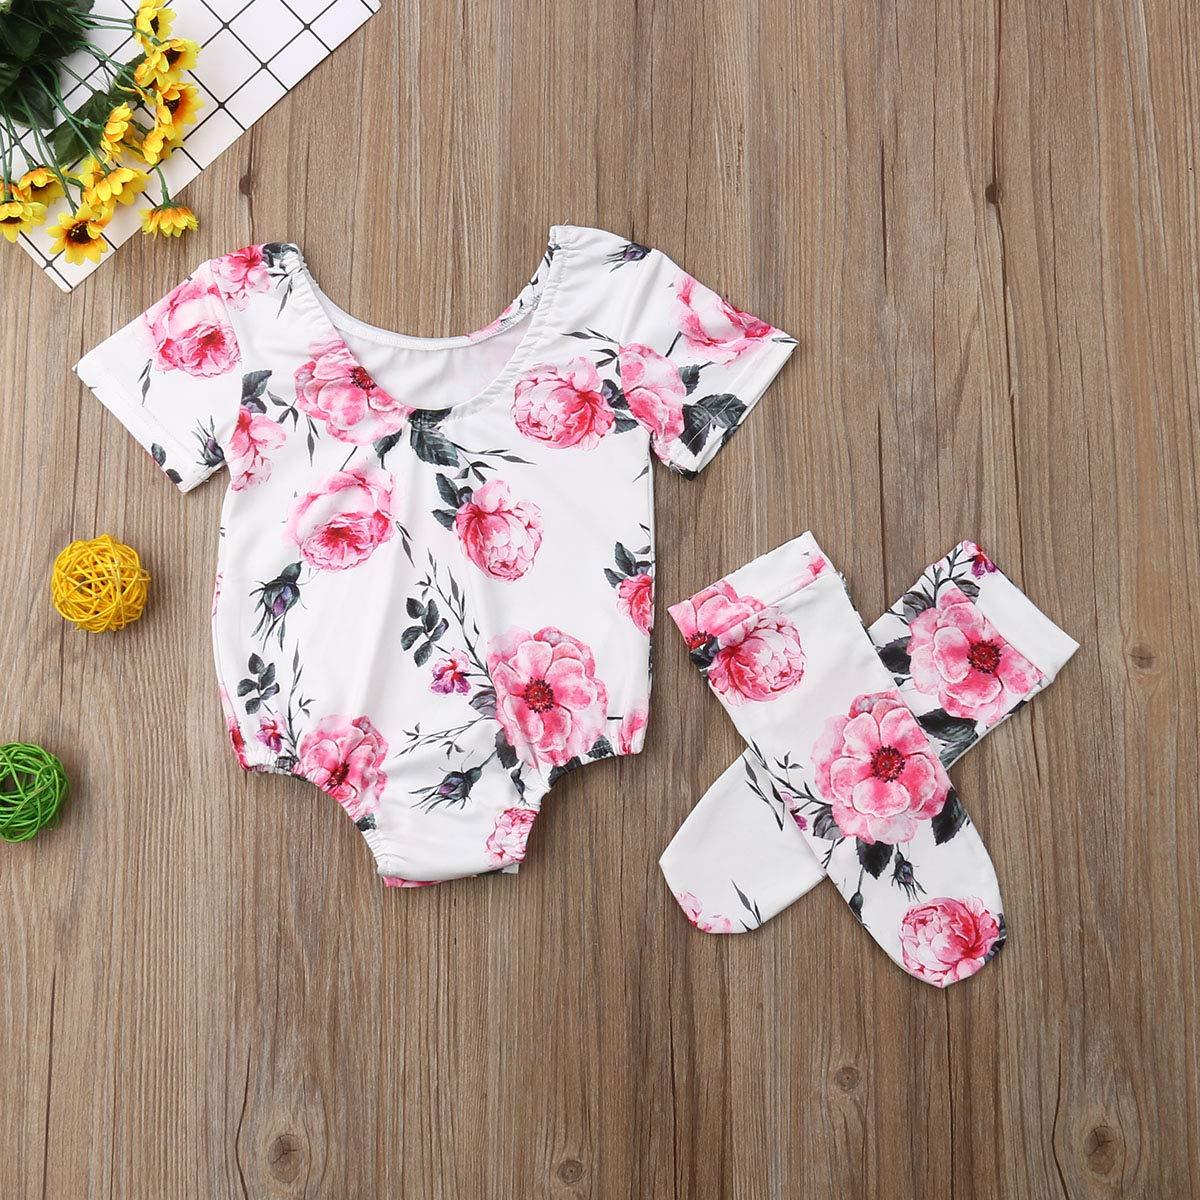 Shawnlen Neugeborenes Baby Overall Set Rundhals Langarm Rose Druck Romper Socken Outfits 0-18 Monate